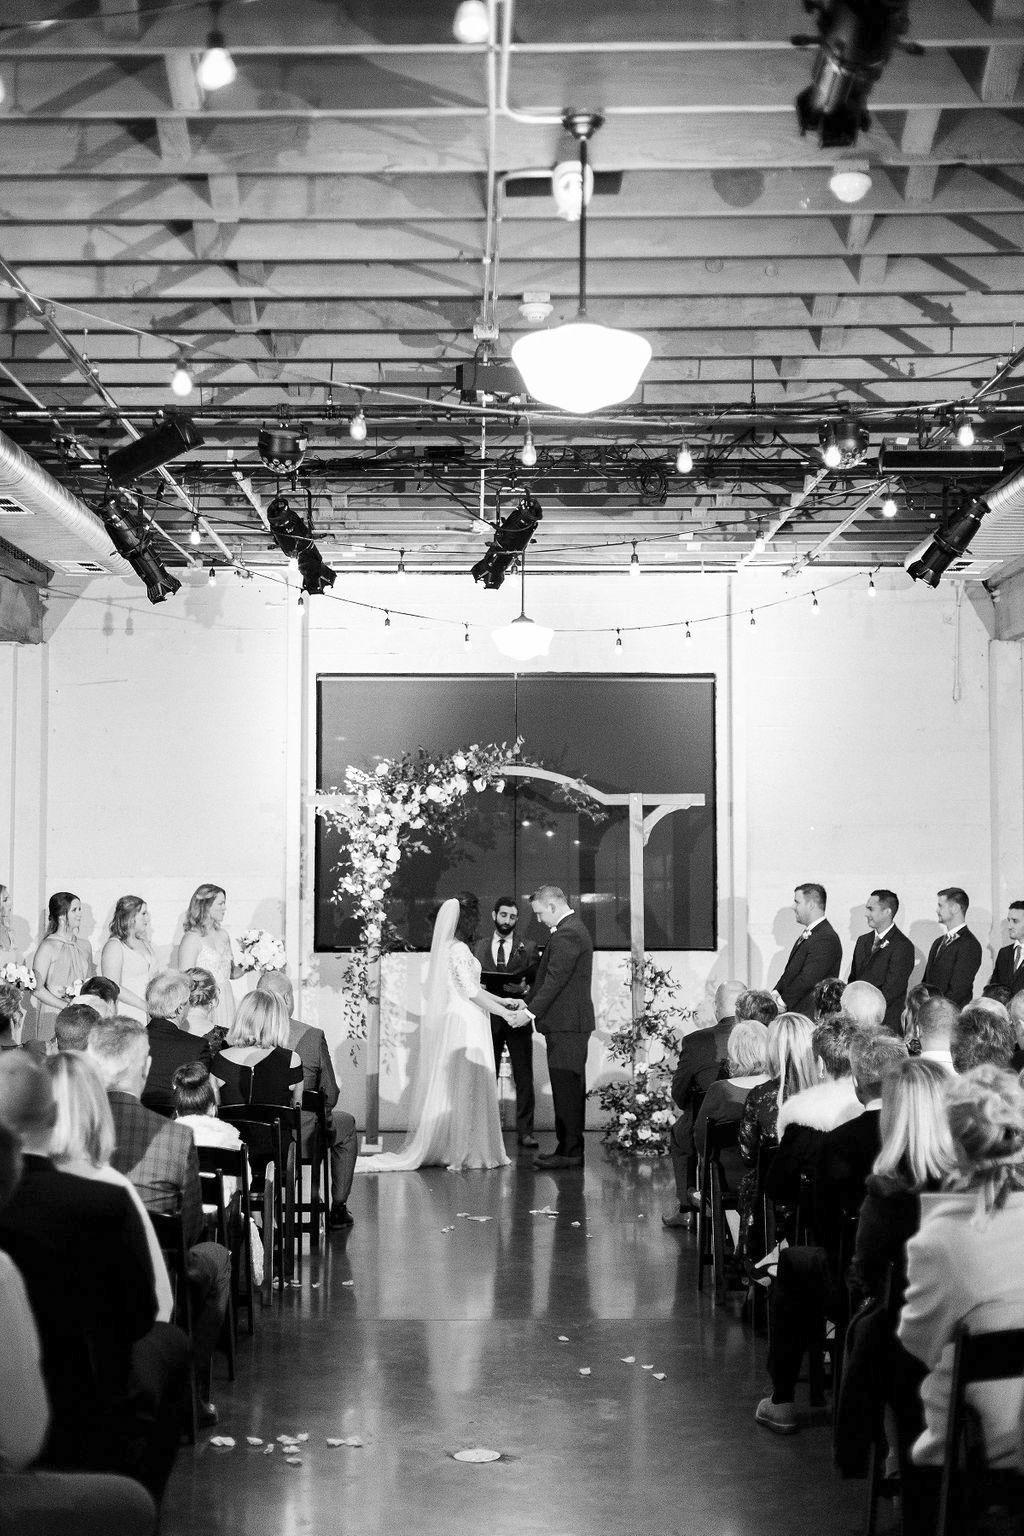 274portland,oregon,castaway,wedding,by_outlive_creative,photo,and,video.jpg